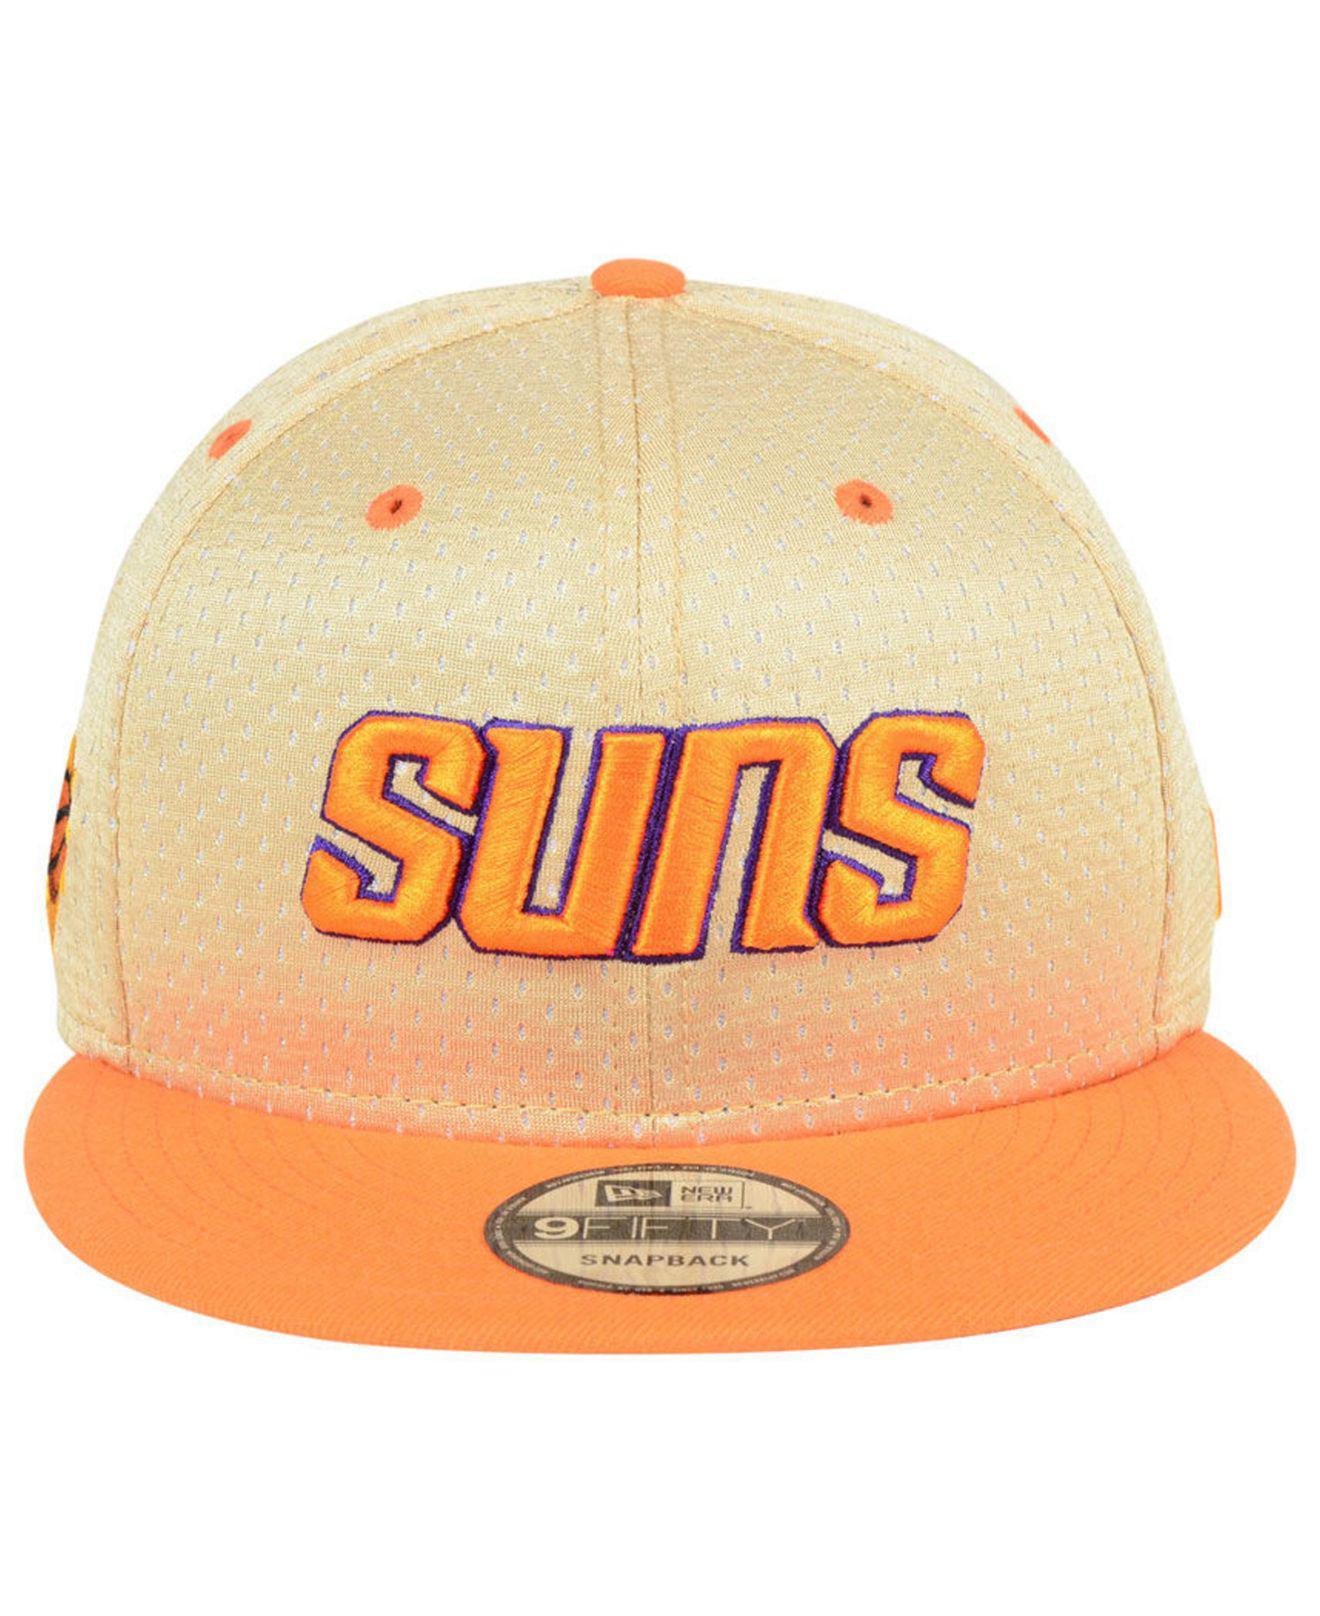 timeless design 25e90 7c1ac ... discount code for lyst ktz phoenix suns champagne 9fifty snapback cap  in orange for men 83e4a